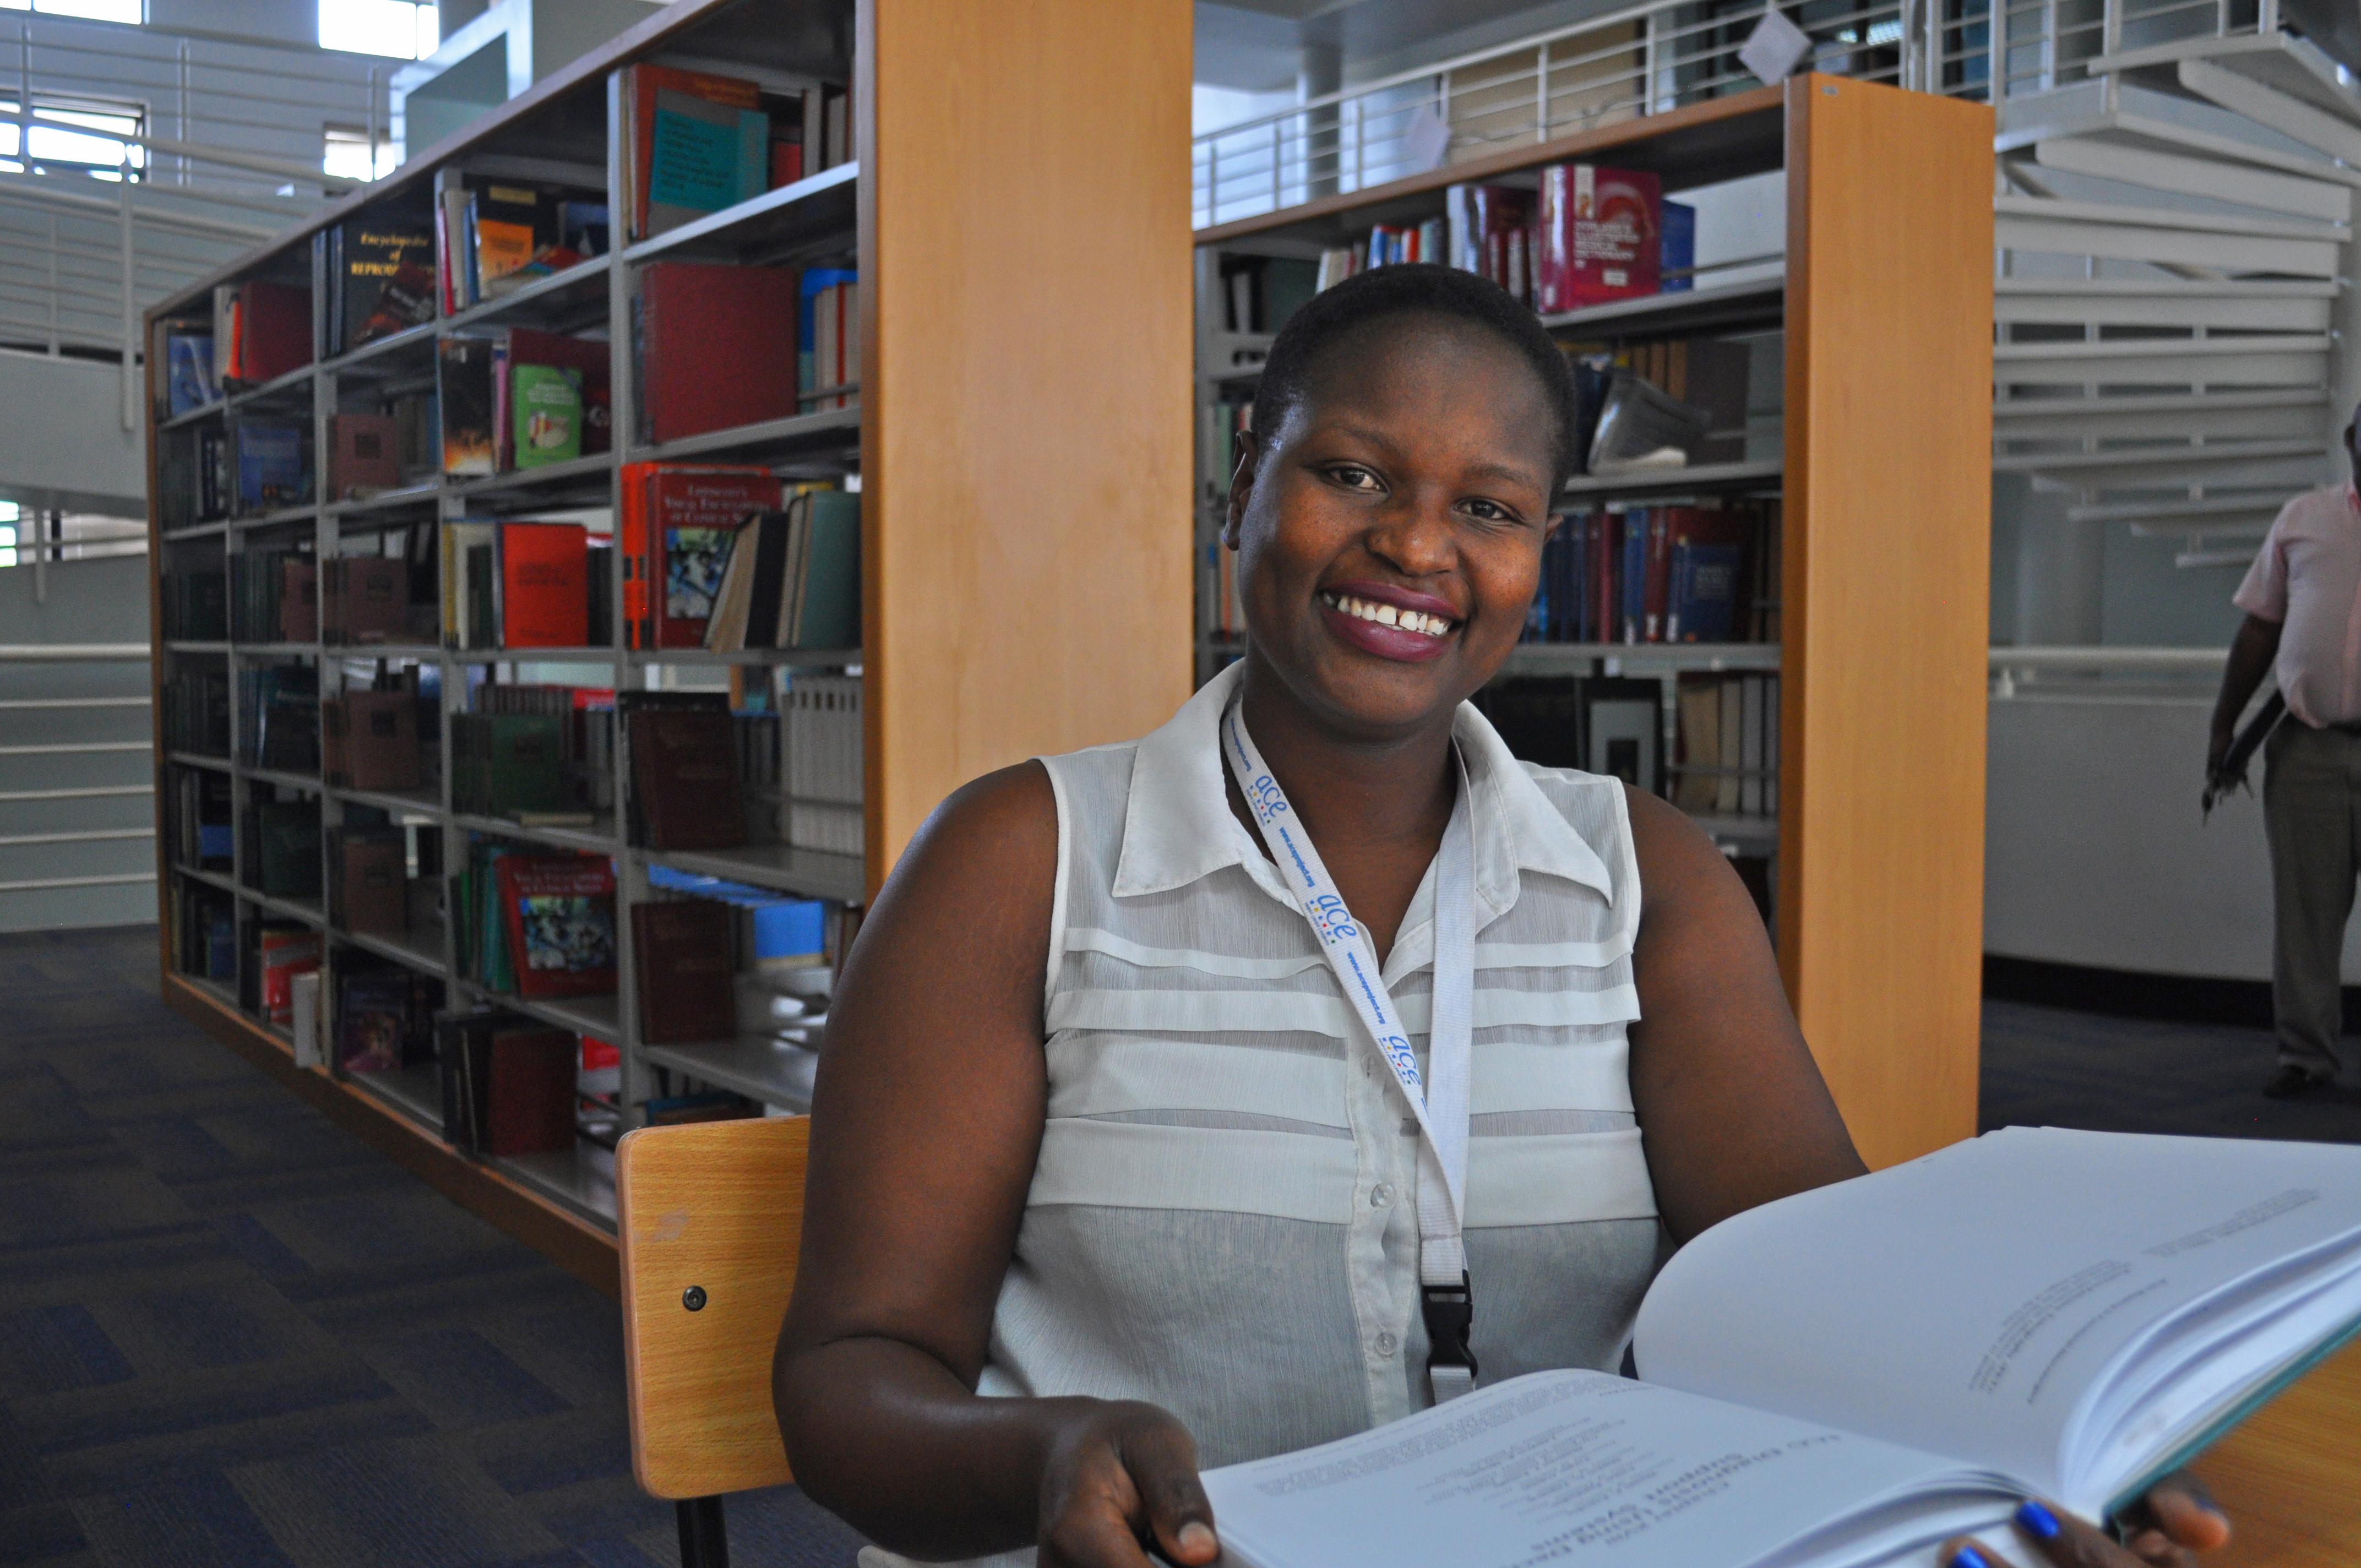 Fikanayo Books and Libraries